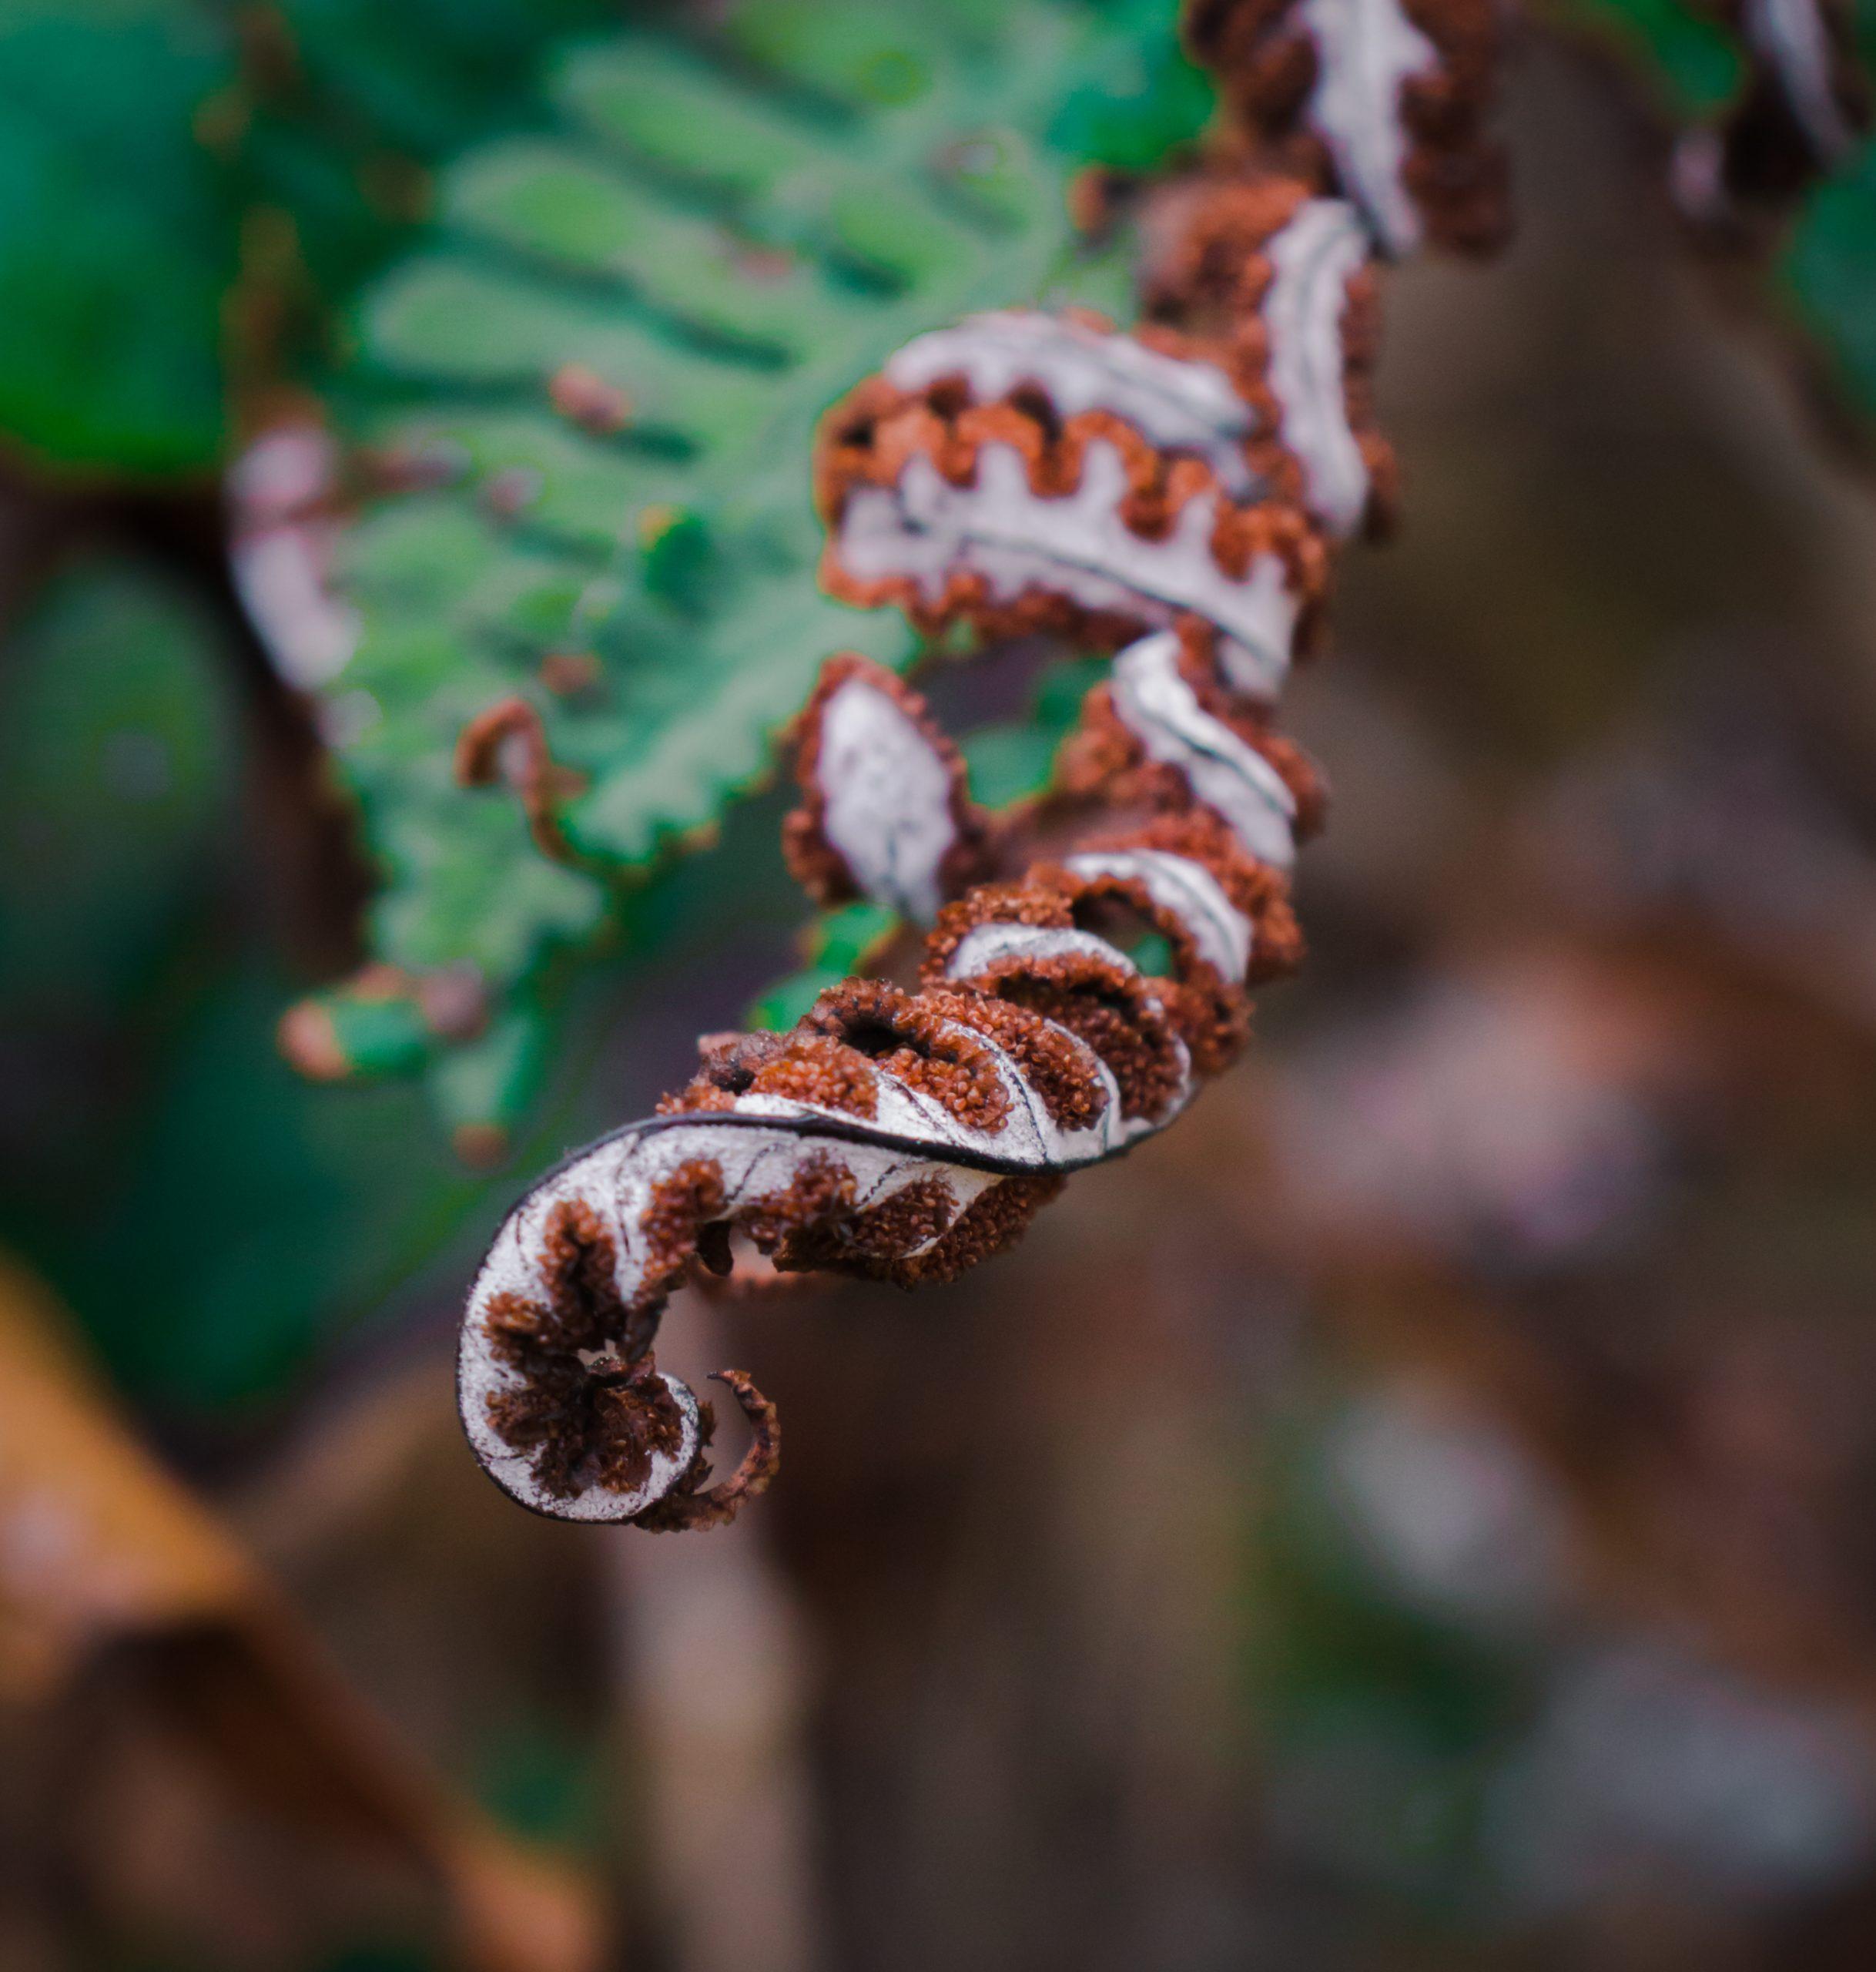 Dry leaf on plant